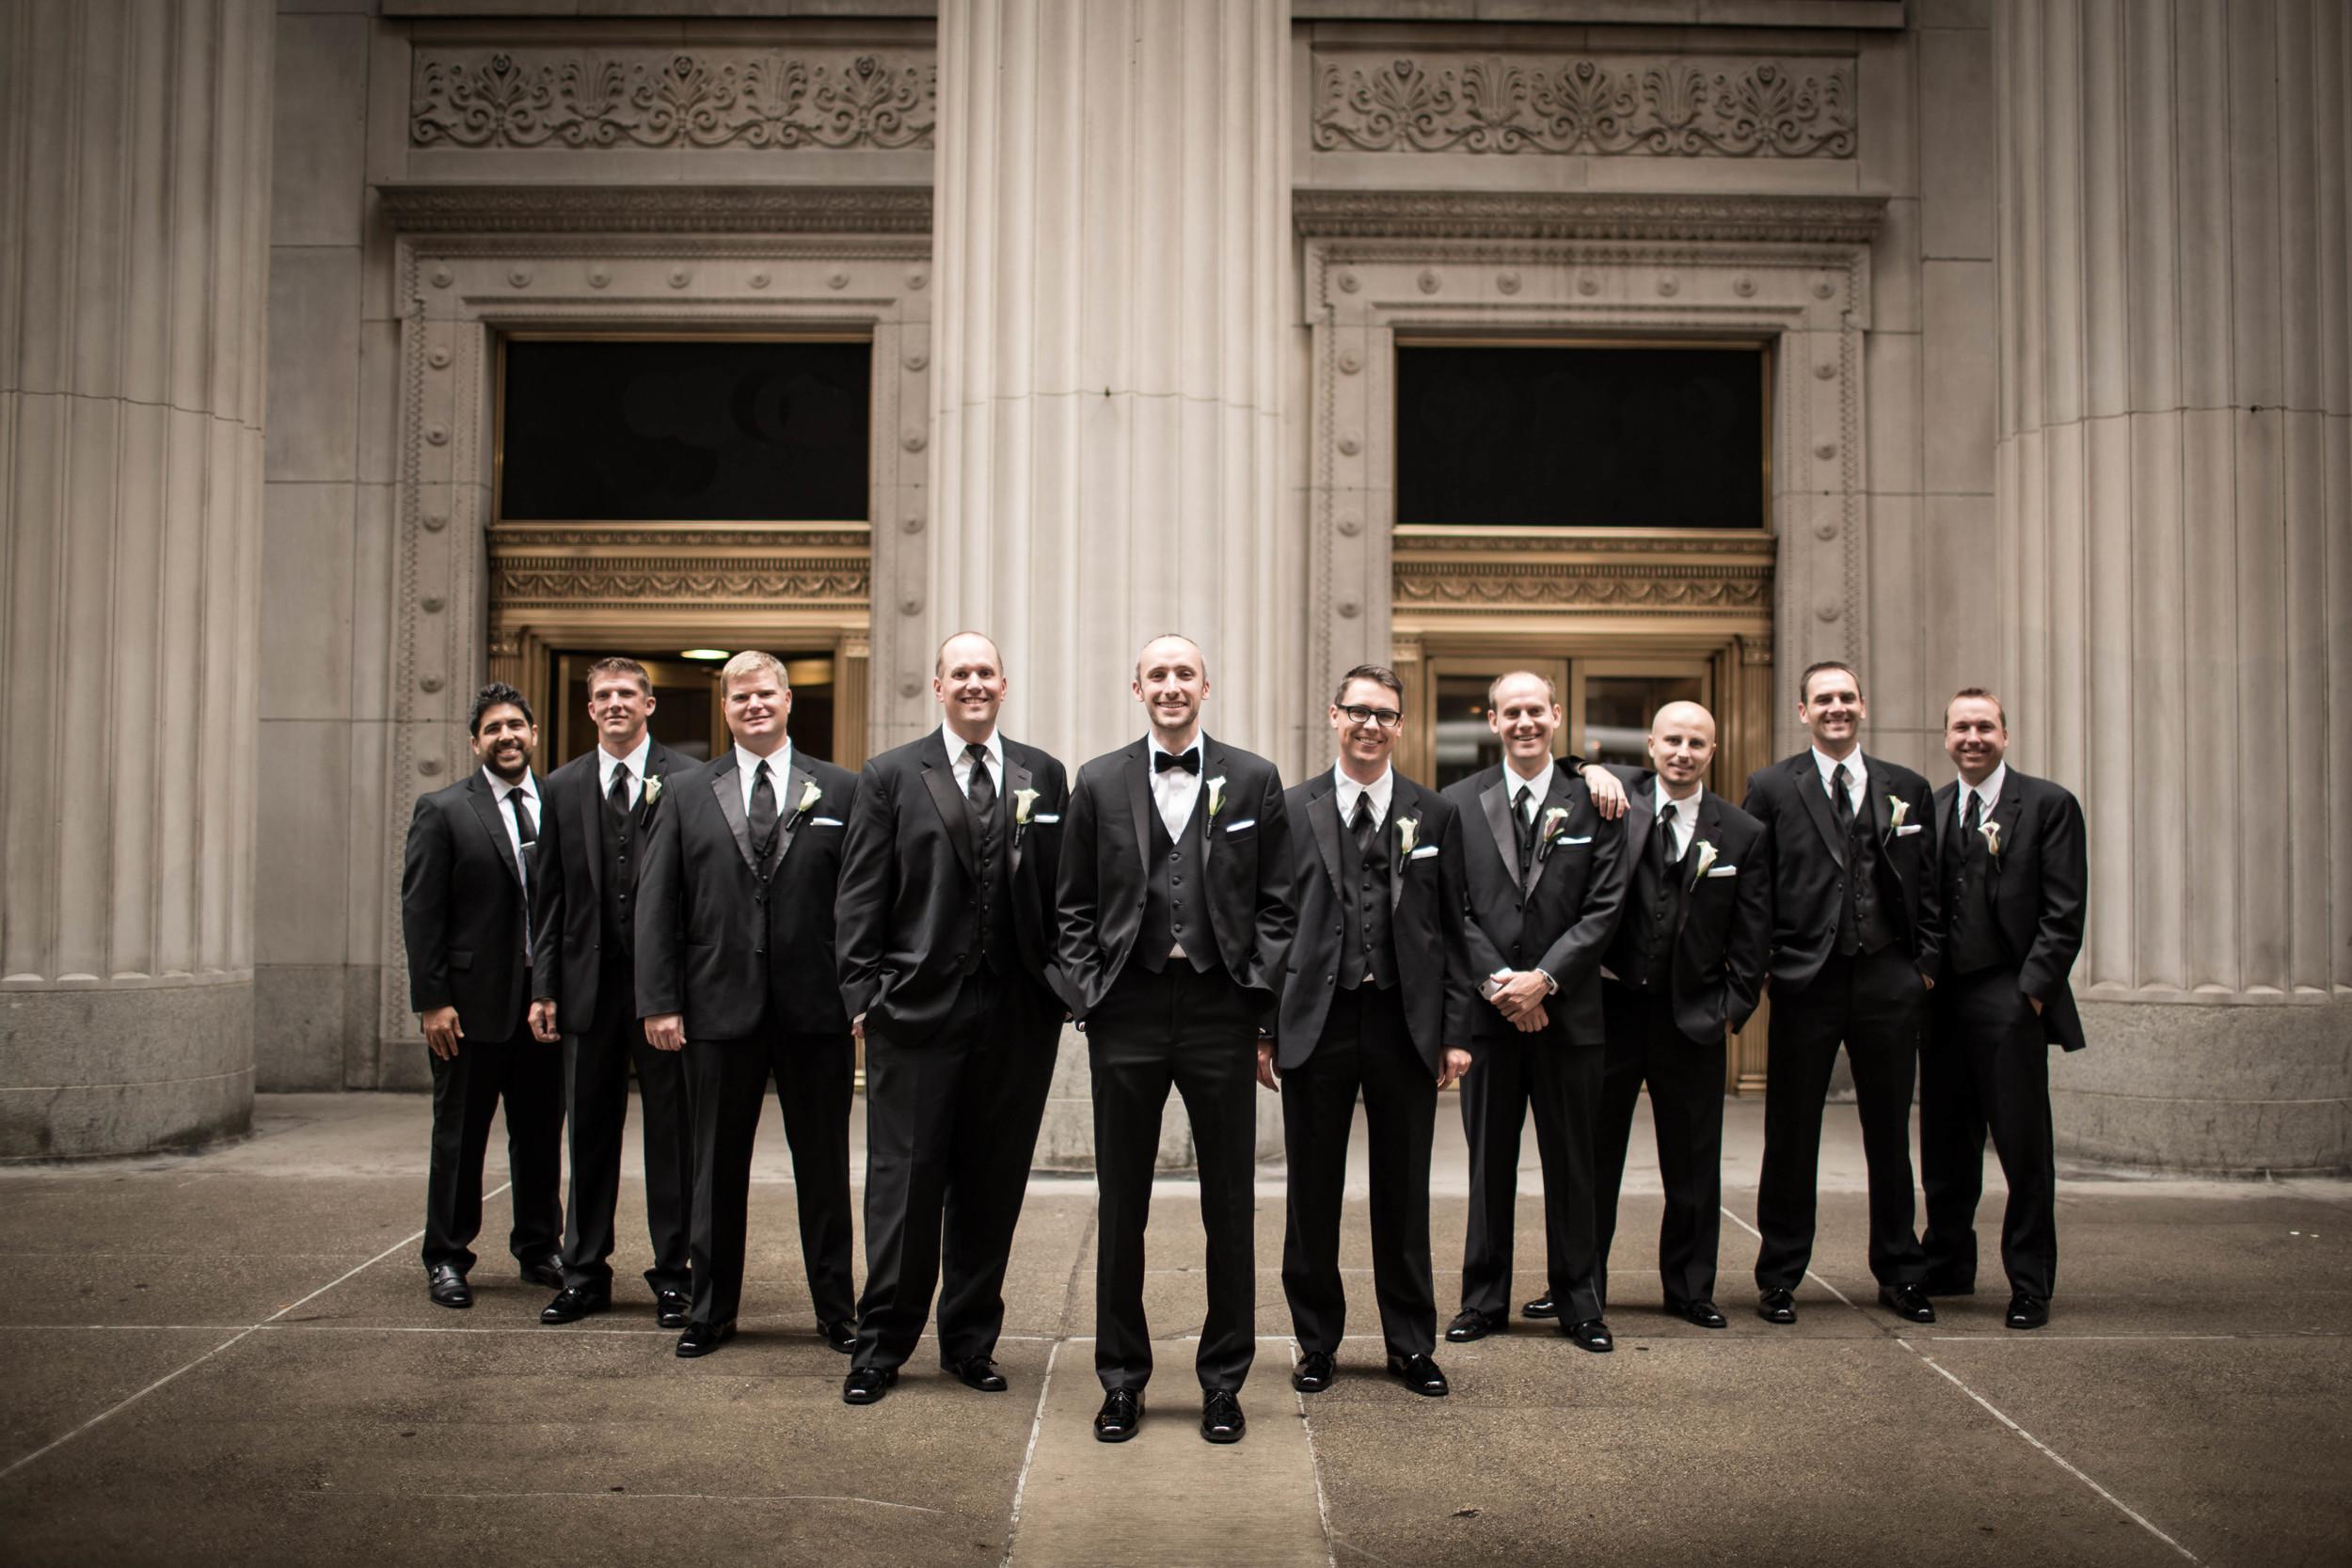 chicago photographer luxury weddings destination photographer bride groom palmer house-008.jpg